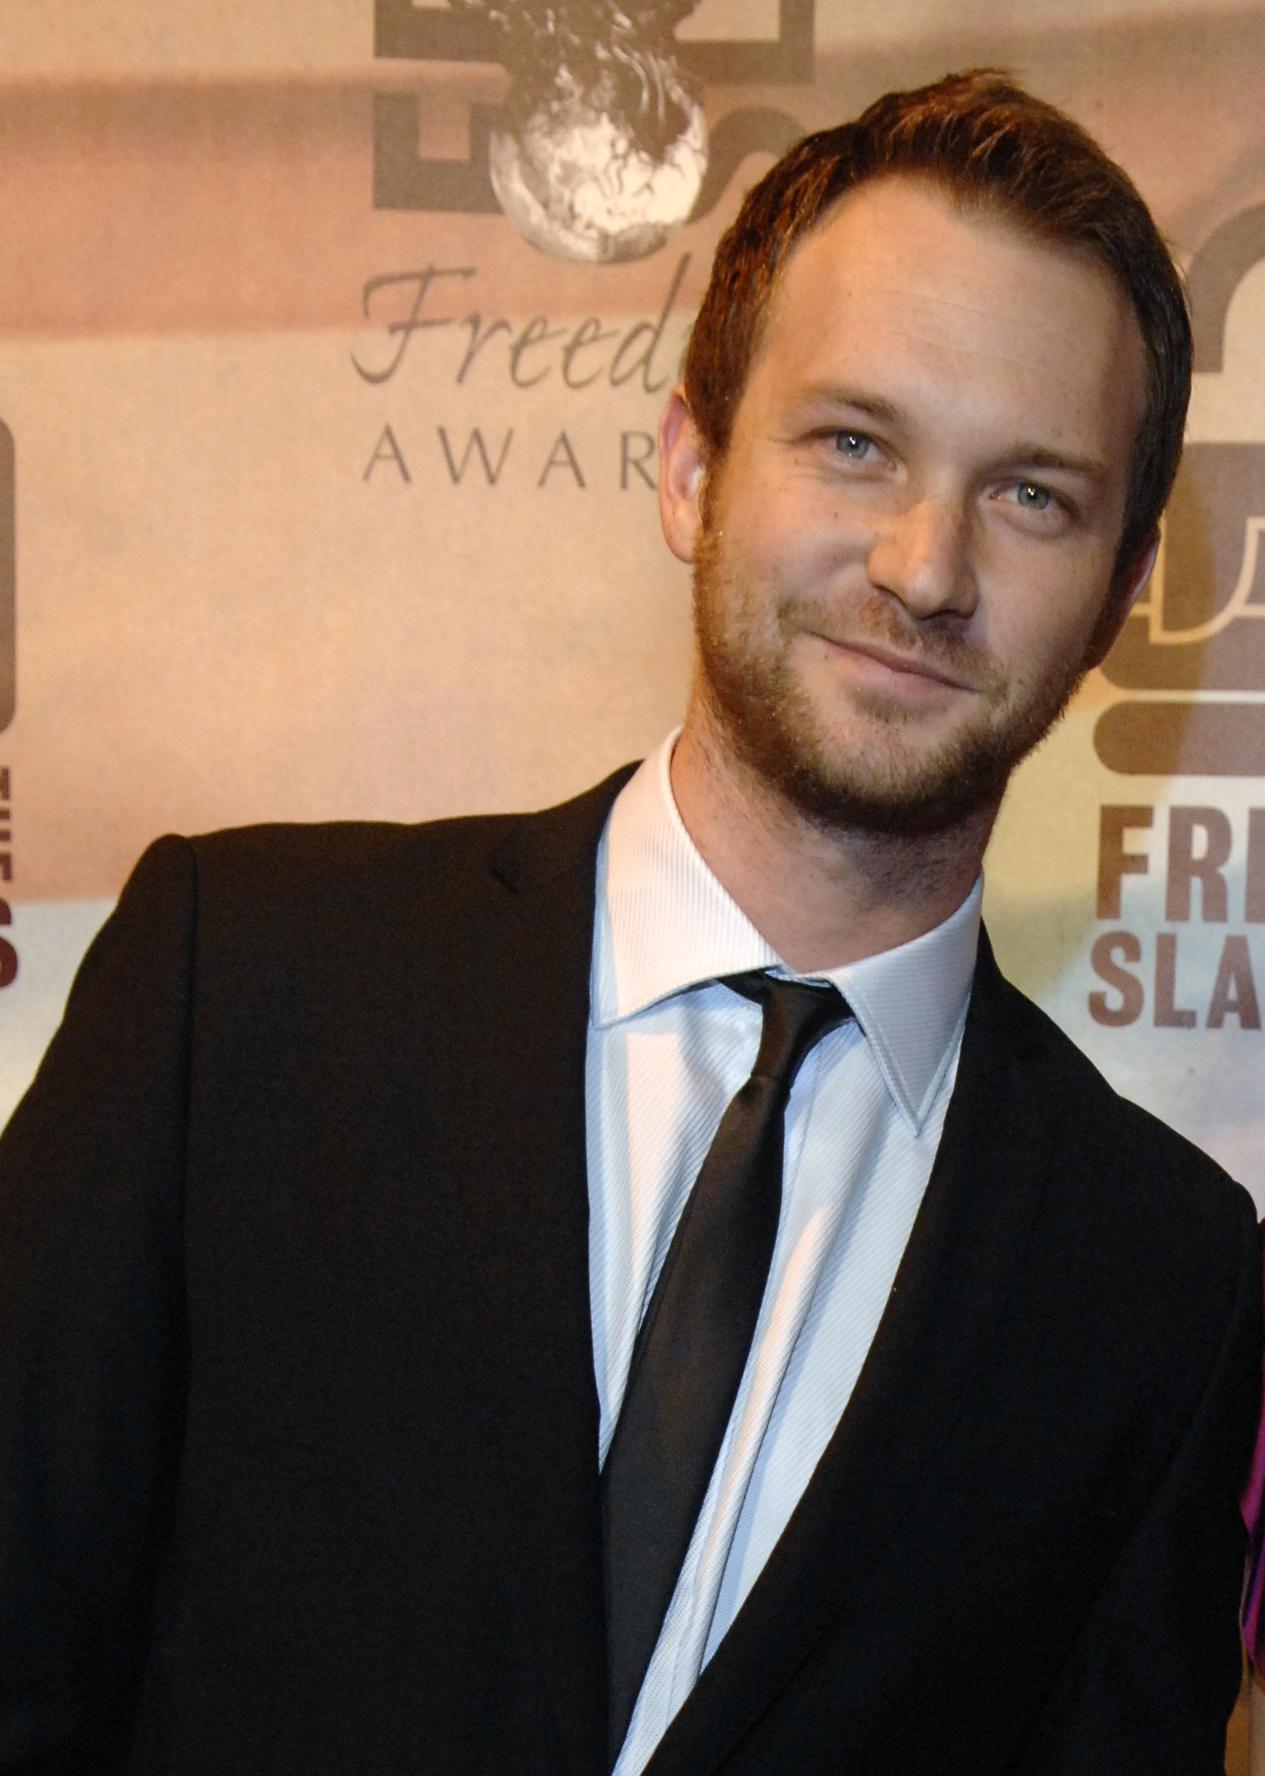 Adam Edgar 2009 Freedom Awards